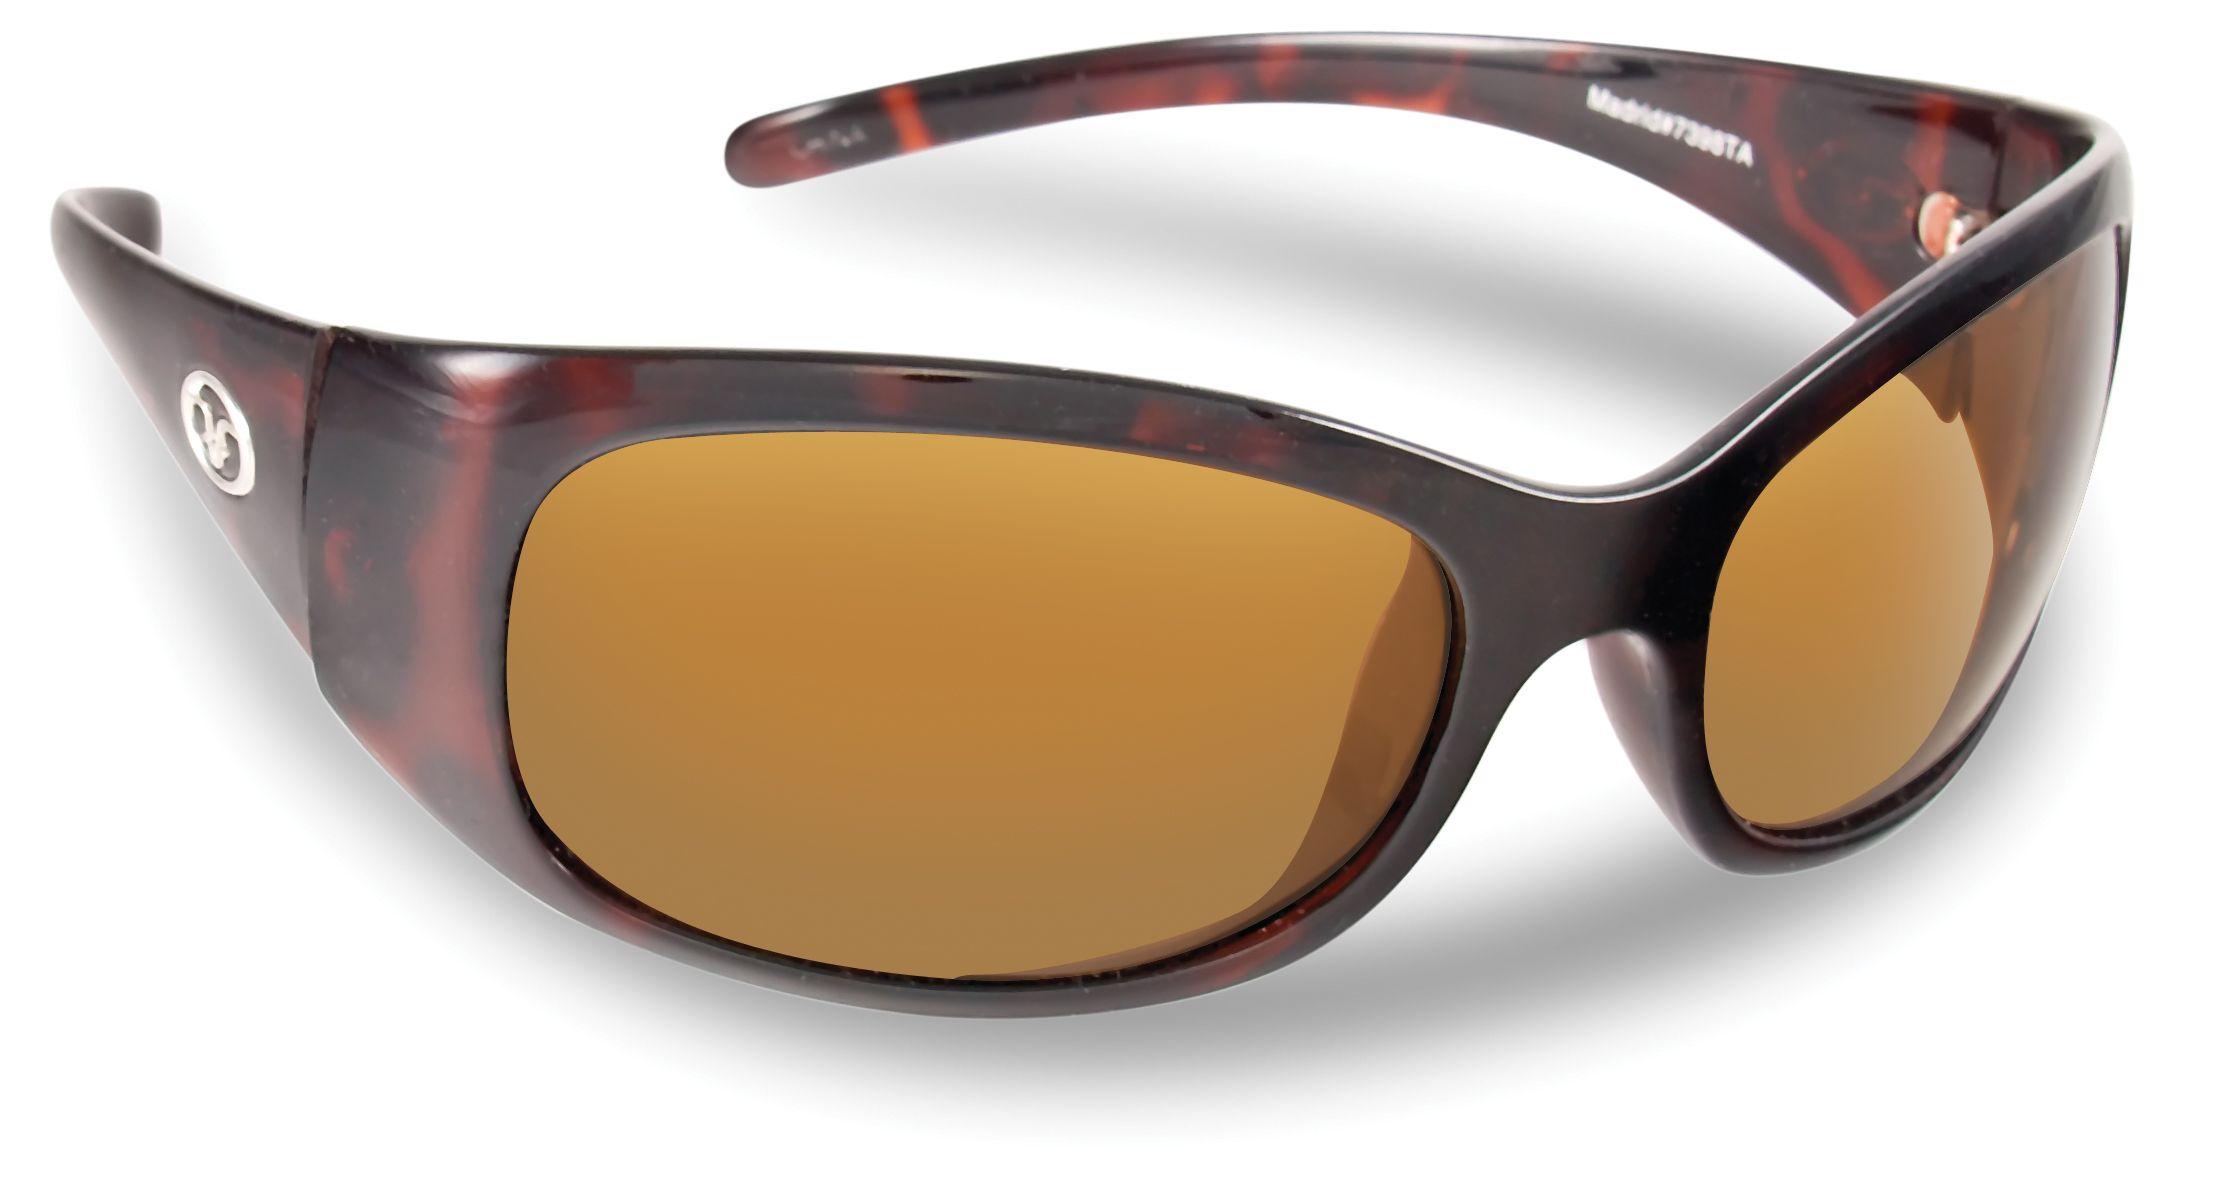 Madrid Tortoise Amber polarized sunglasses by Flying